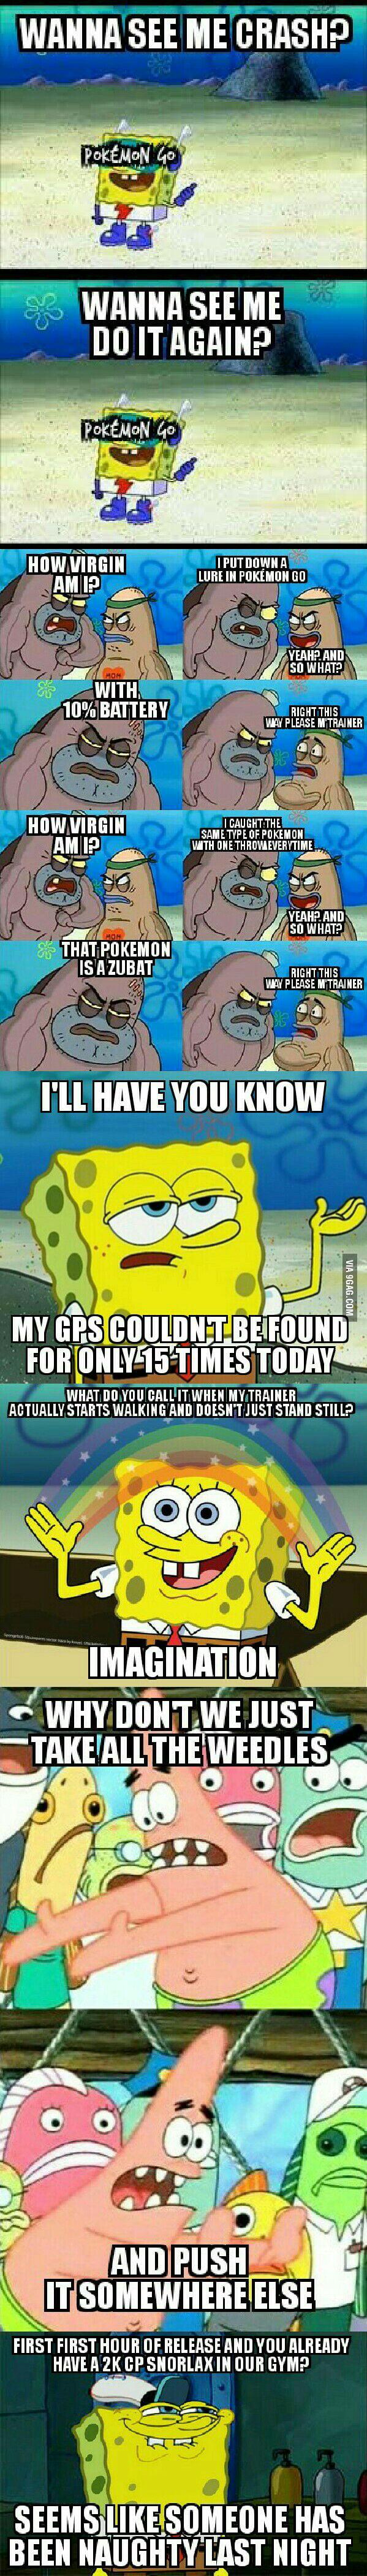 My pokemon go experience in spongebob memes